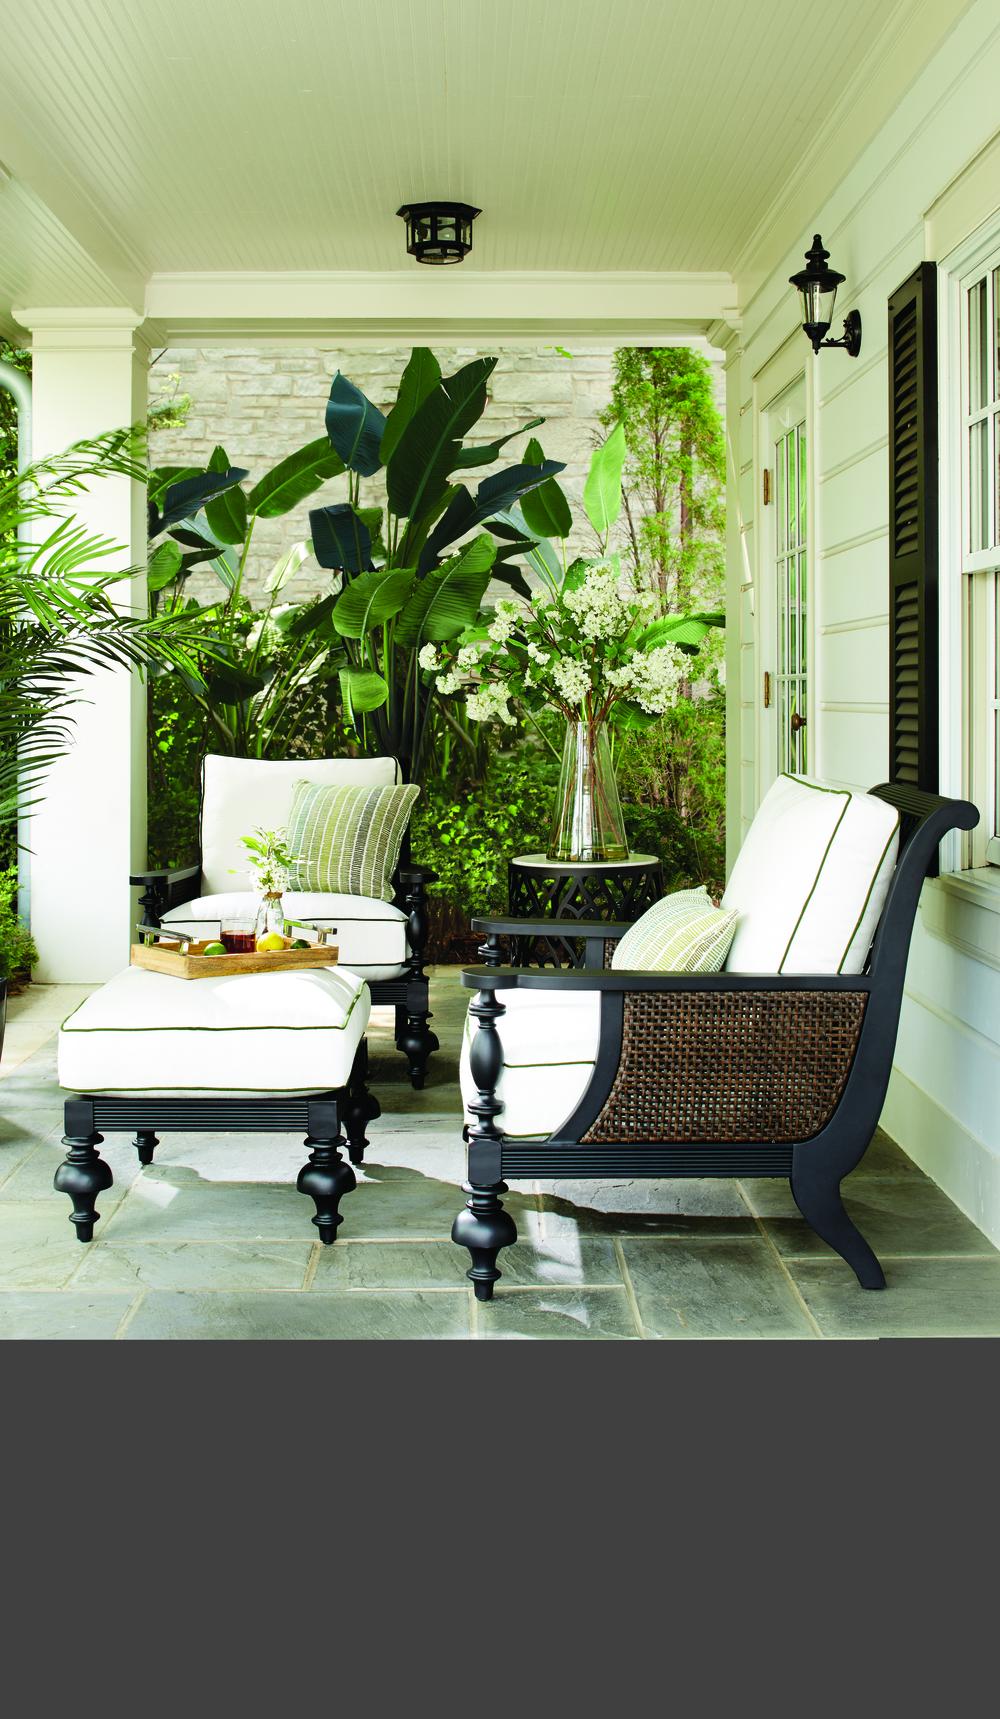 Lane Venture - Lounge Chair